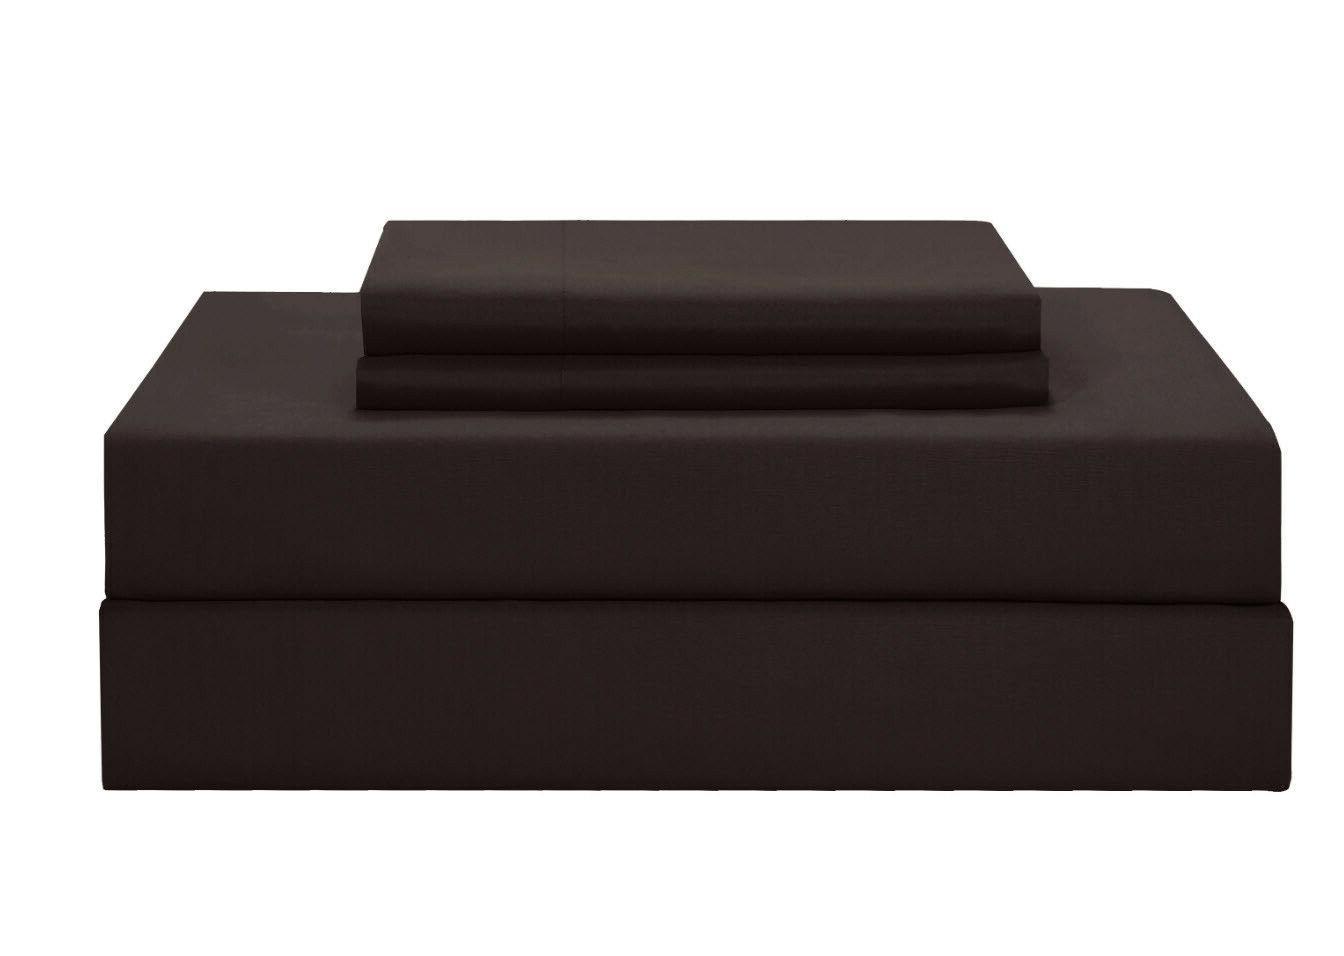 BEIGE COMFORTER SET in a Bedding Pillowcase Multiple Sizes